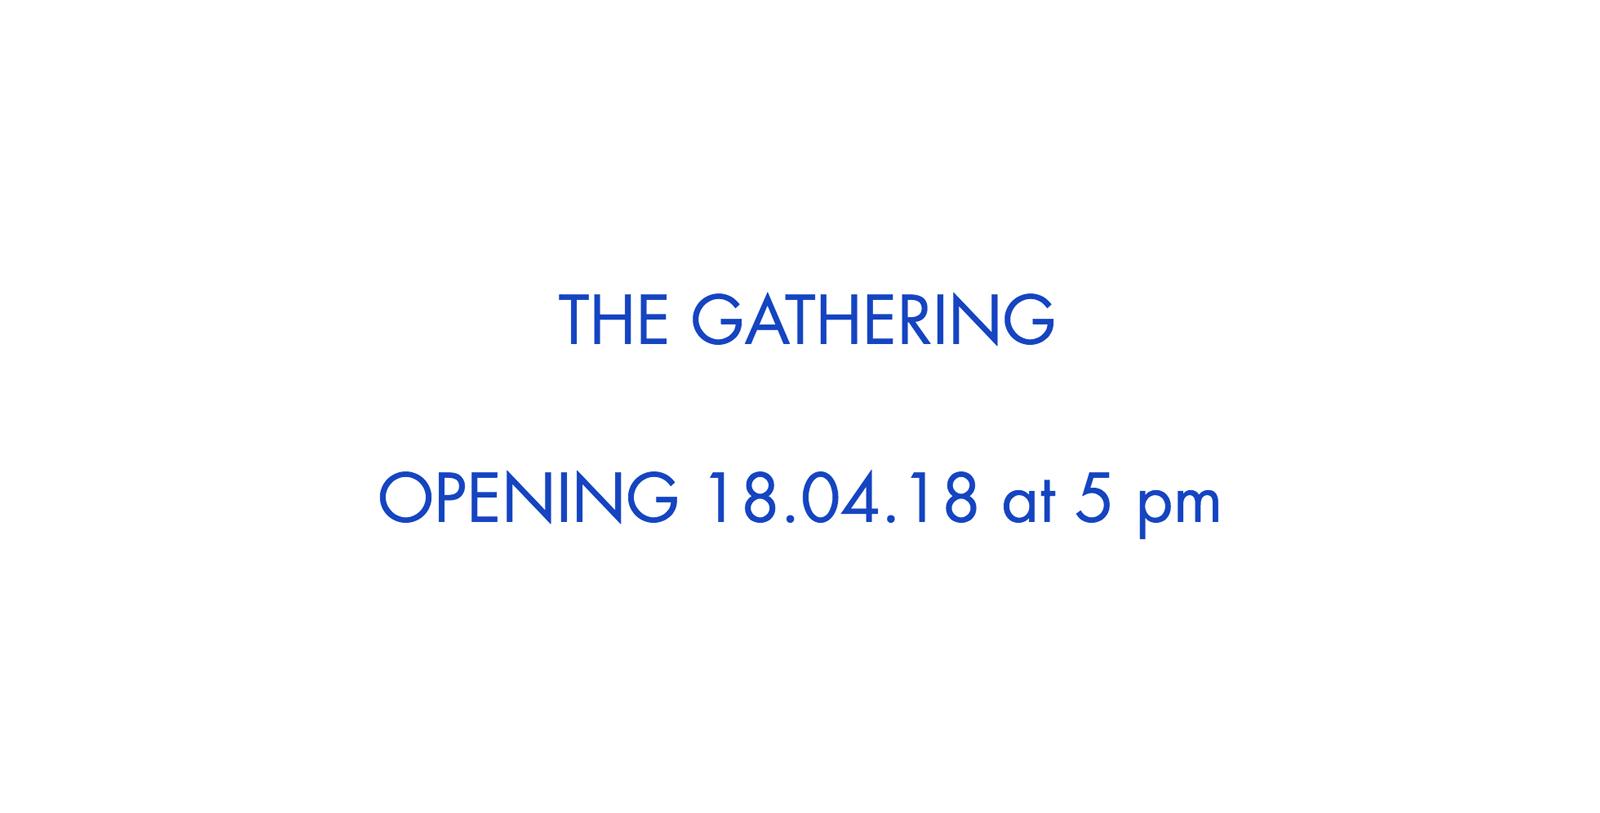 Stefan Rinck The Gathering PANTHERA.TODAY, Bruxelles (BE) 18 avril  — 20 mai 2018